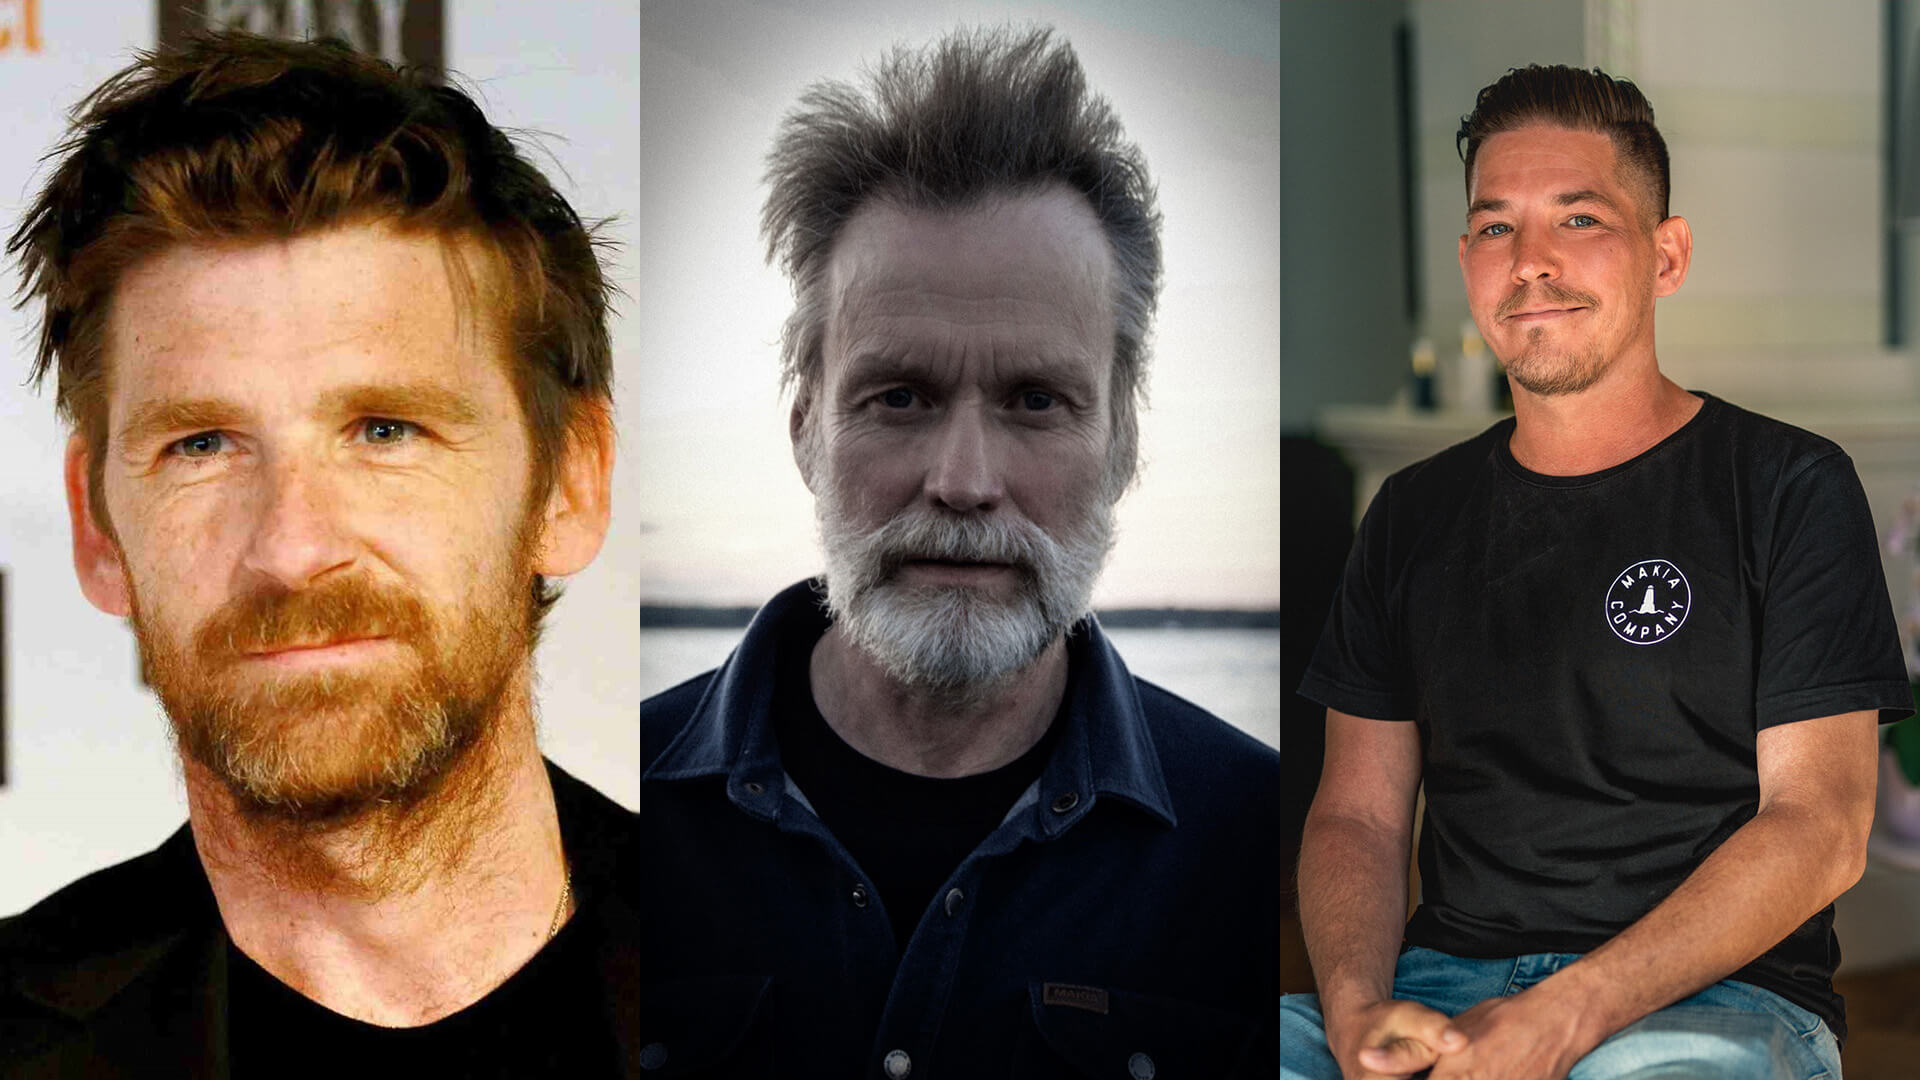 Paul Anderson saapuu Suomeen Jalmari Helanderin uuden elokuvan kuvauksiin Lappiin